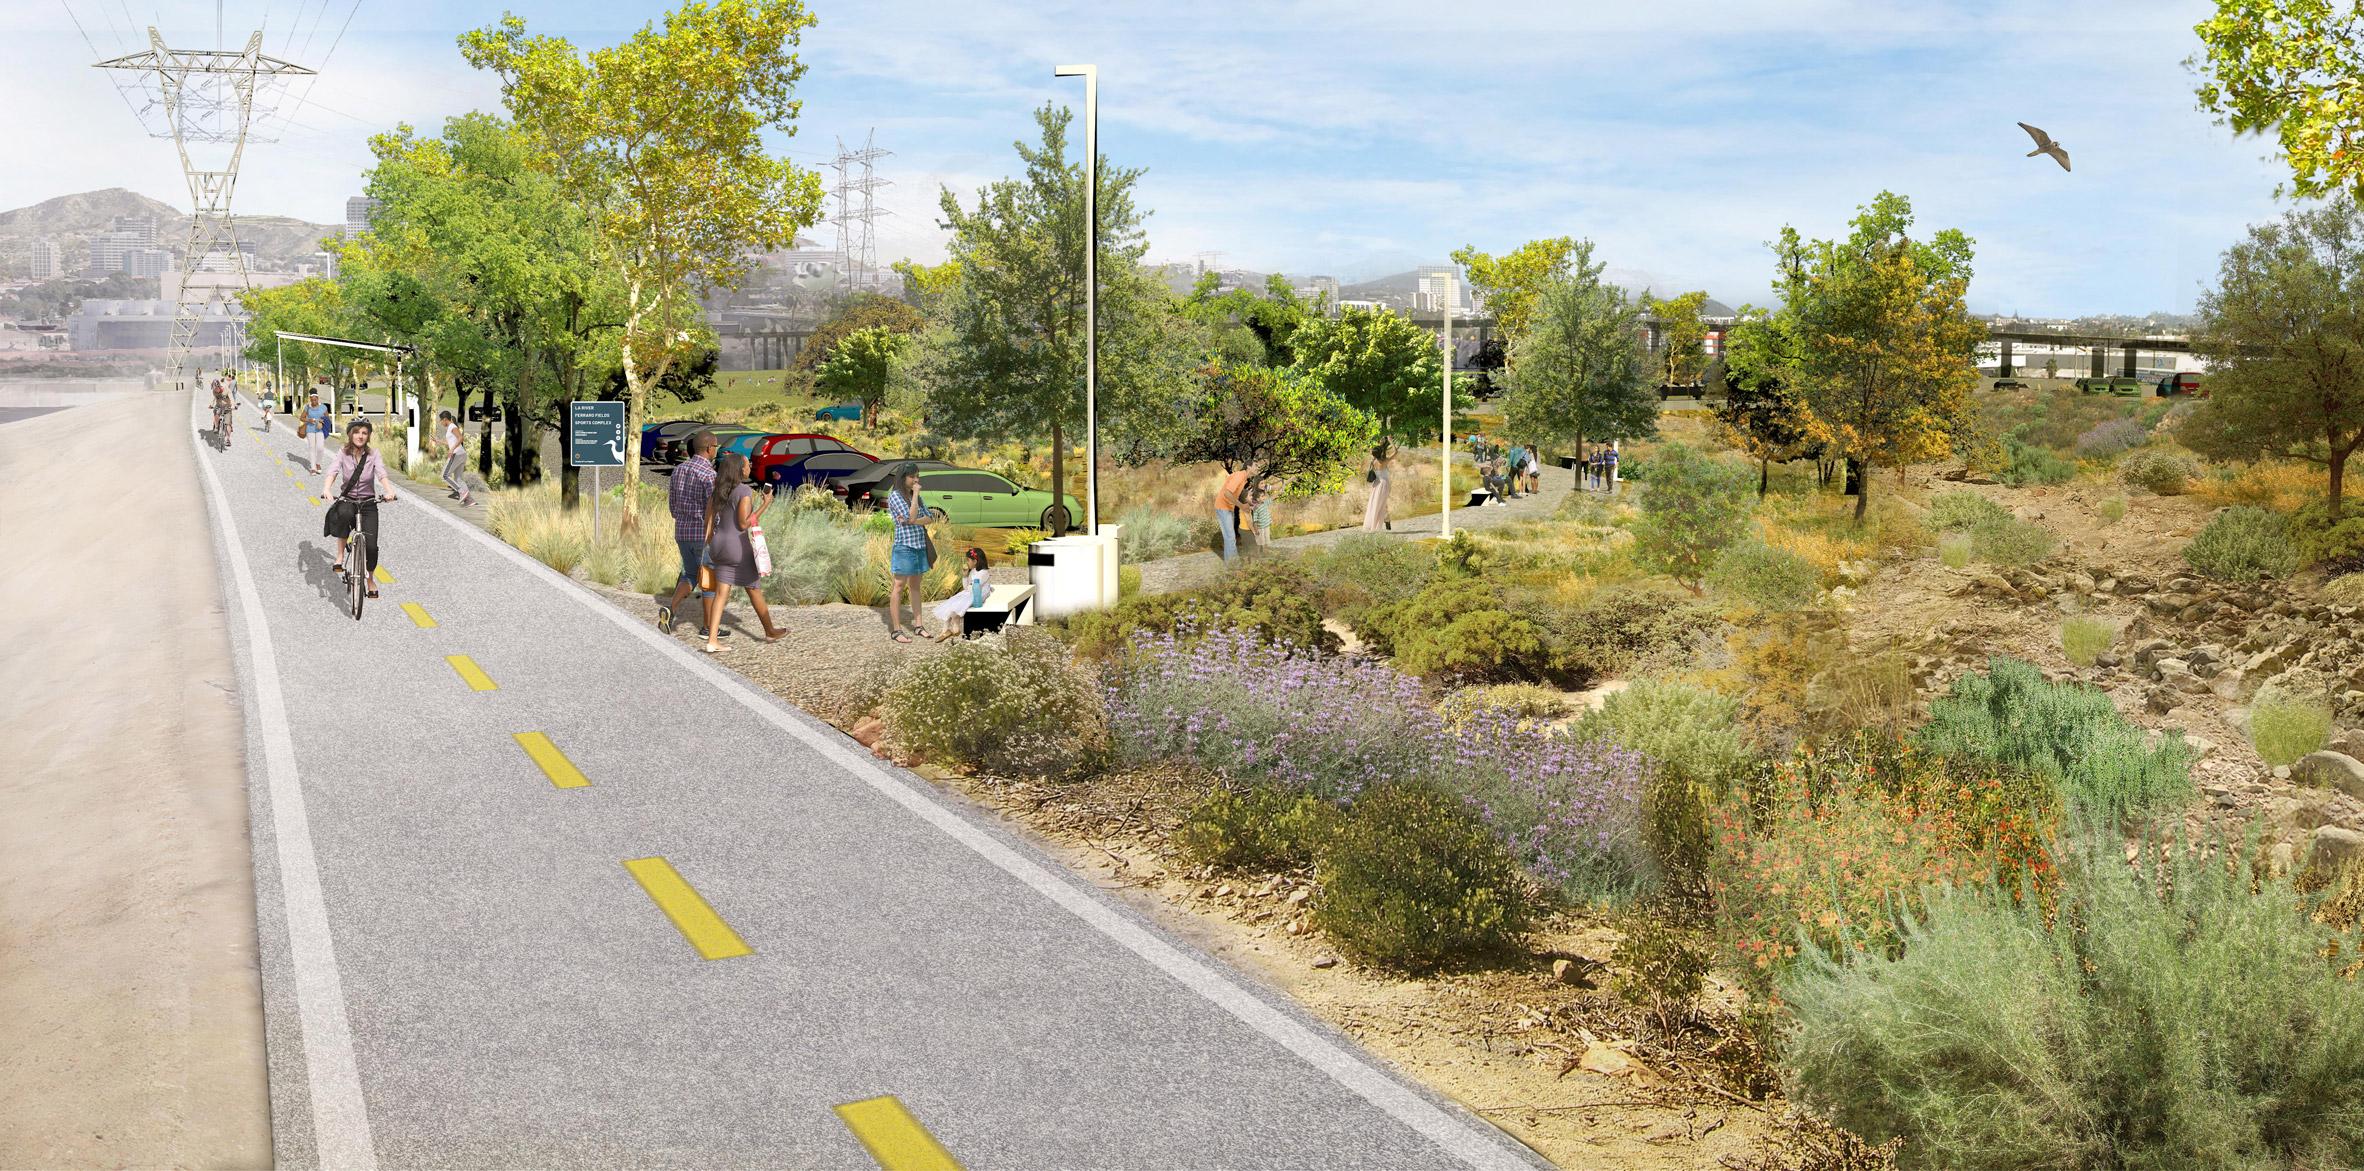 Green corridors planned for the LA River